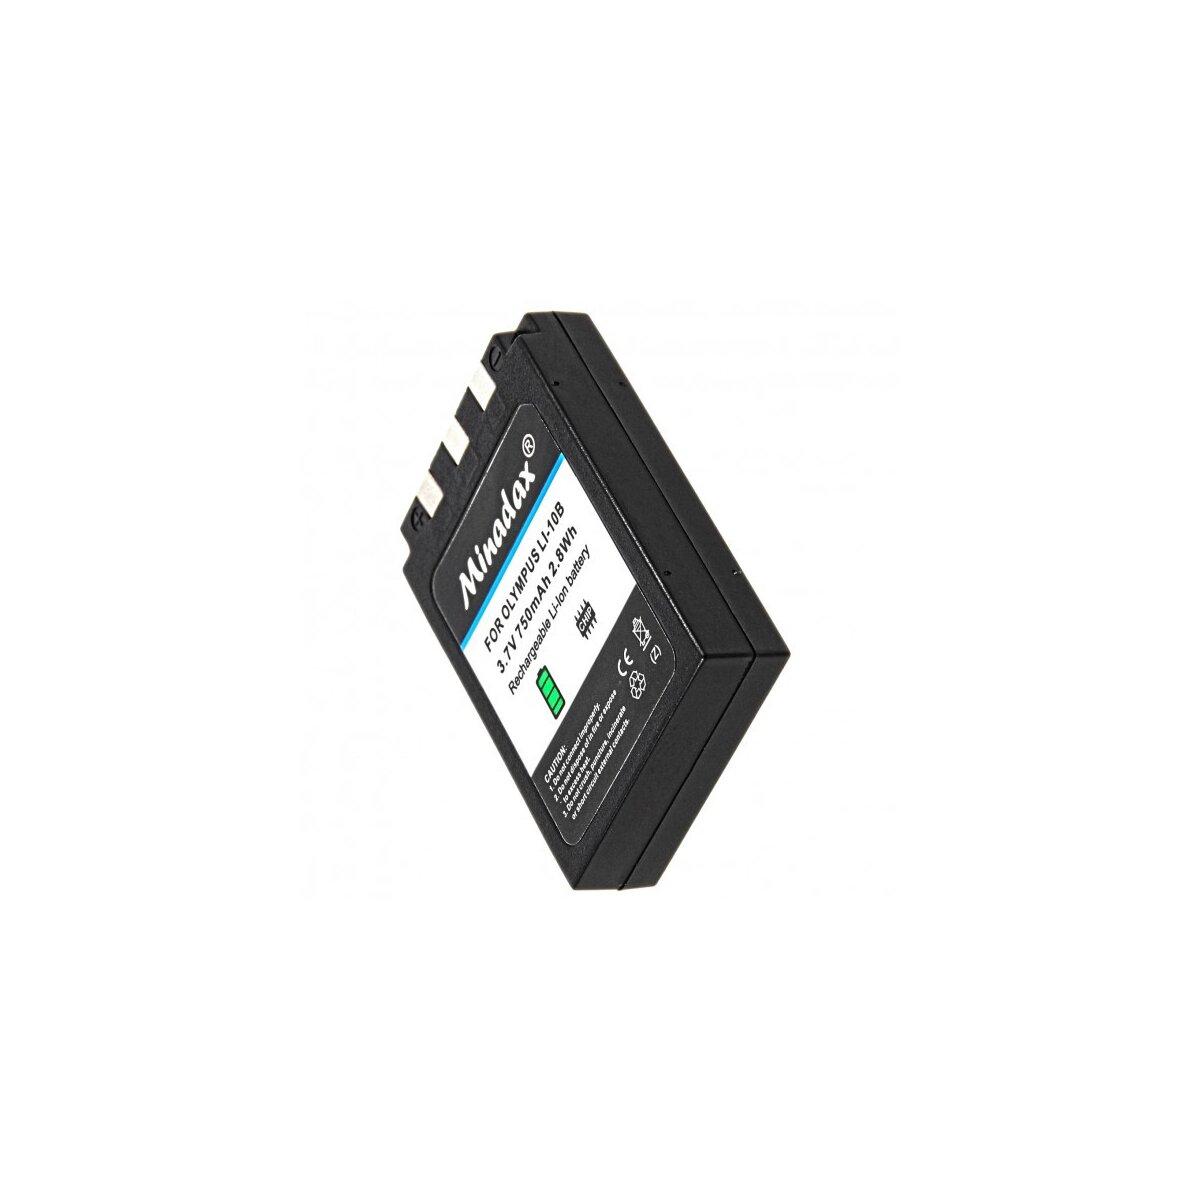 Minadax® Qualitaetsakku mit echten 750 mAh fuer Olympus µ 300 400 500, Camedia C-50 C-5000 C-760 C-765 C-770, wie LI-10B - Intelligentes Akkusystem mit Chip